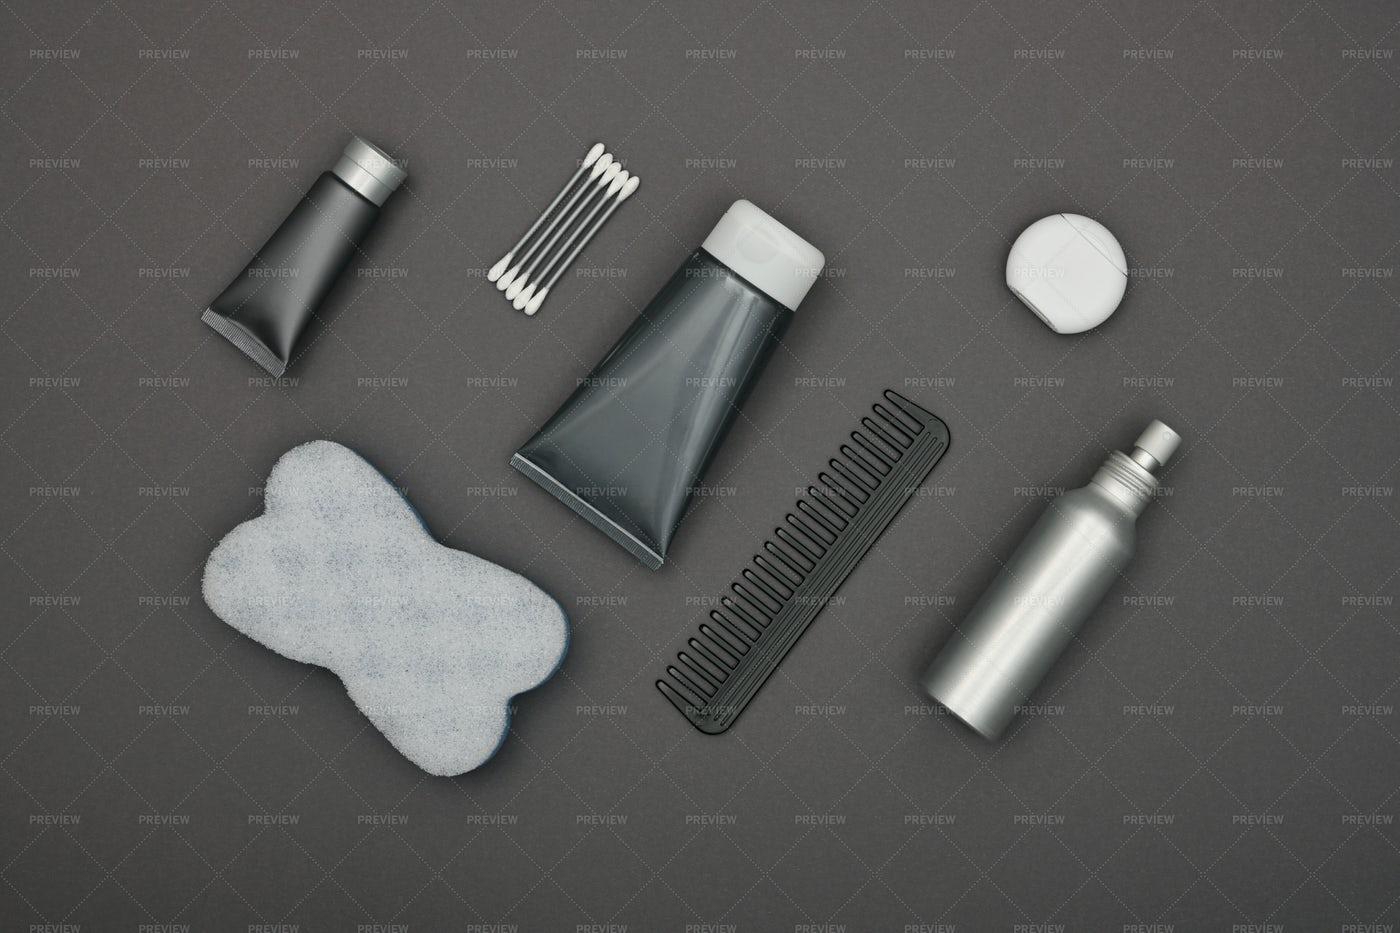 Black Hygiene Products: Stock Photos